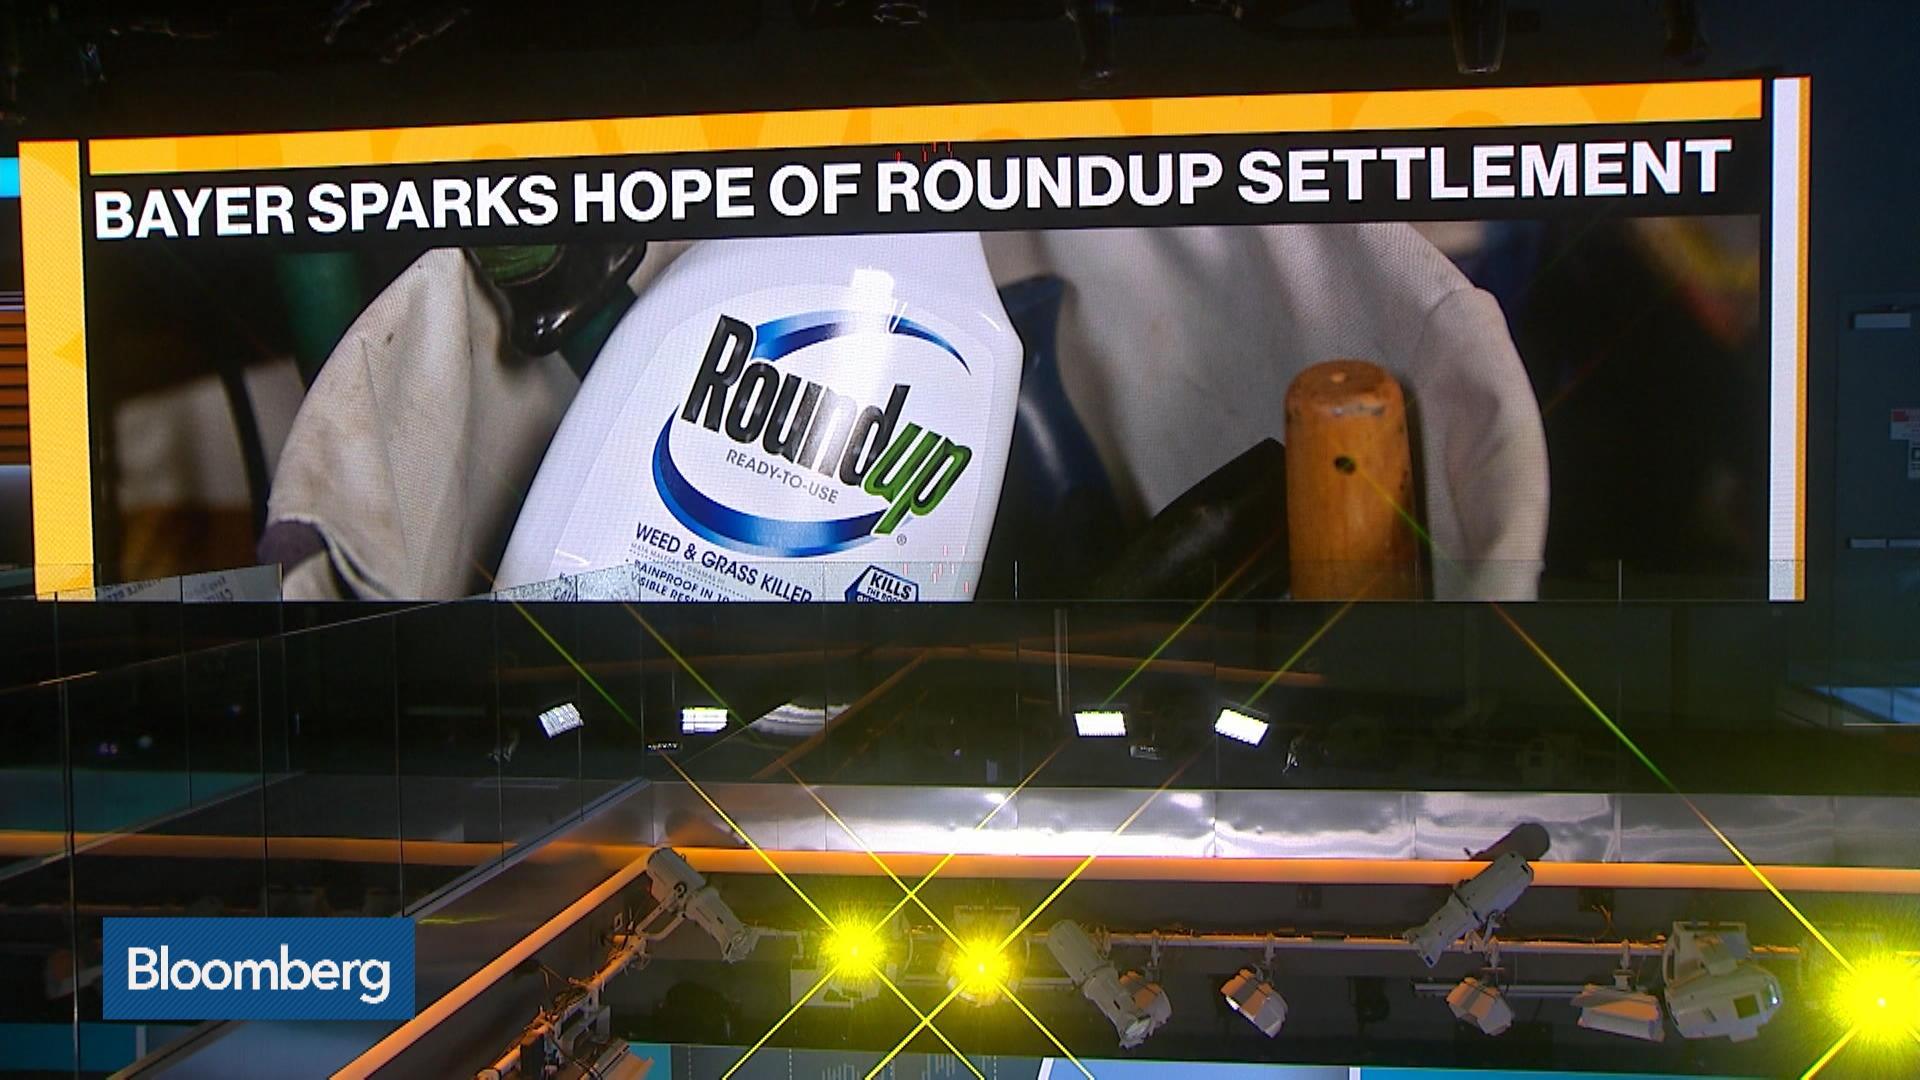 Bayer Roundup Legal Adviser Known for Fighting, Not Settling